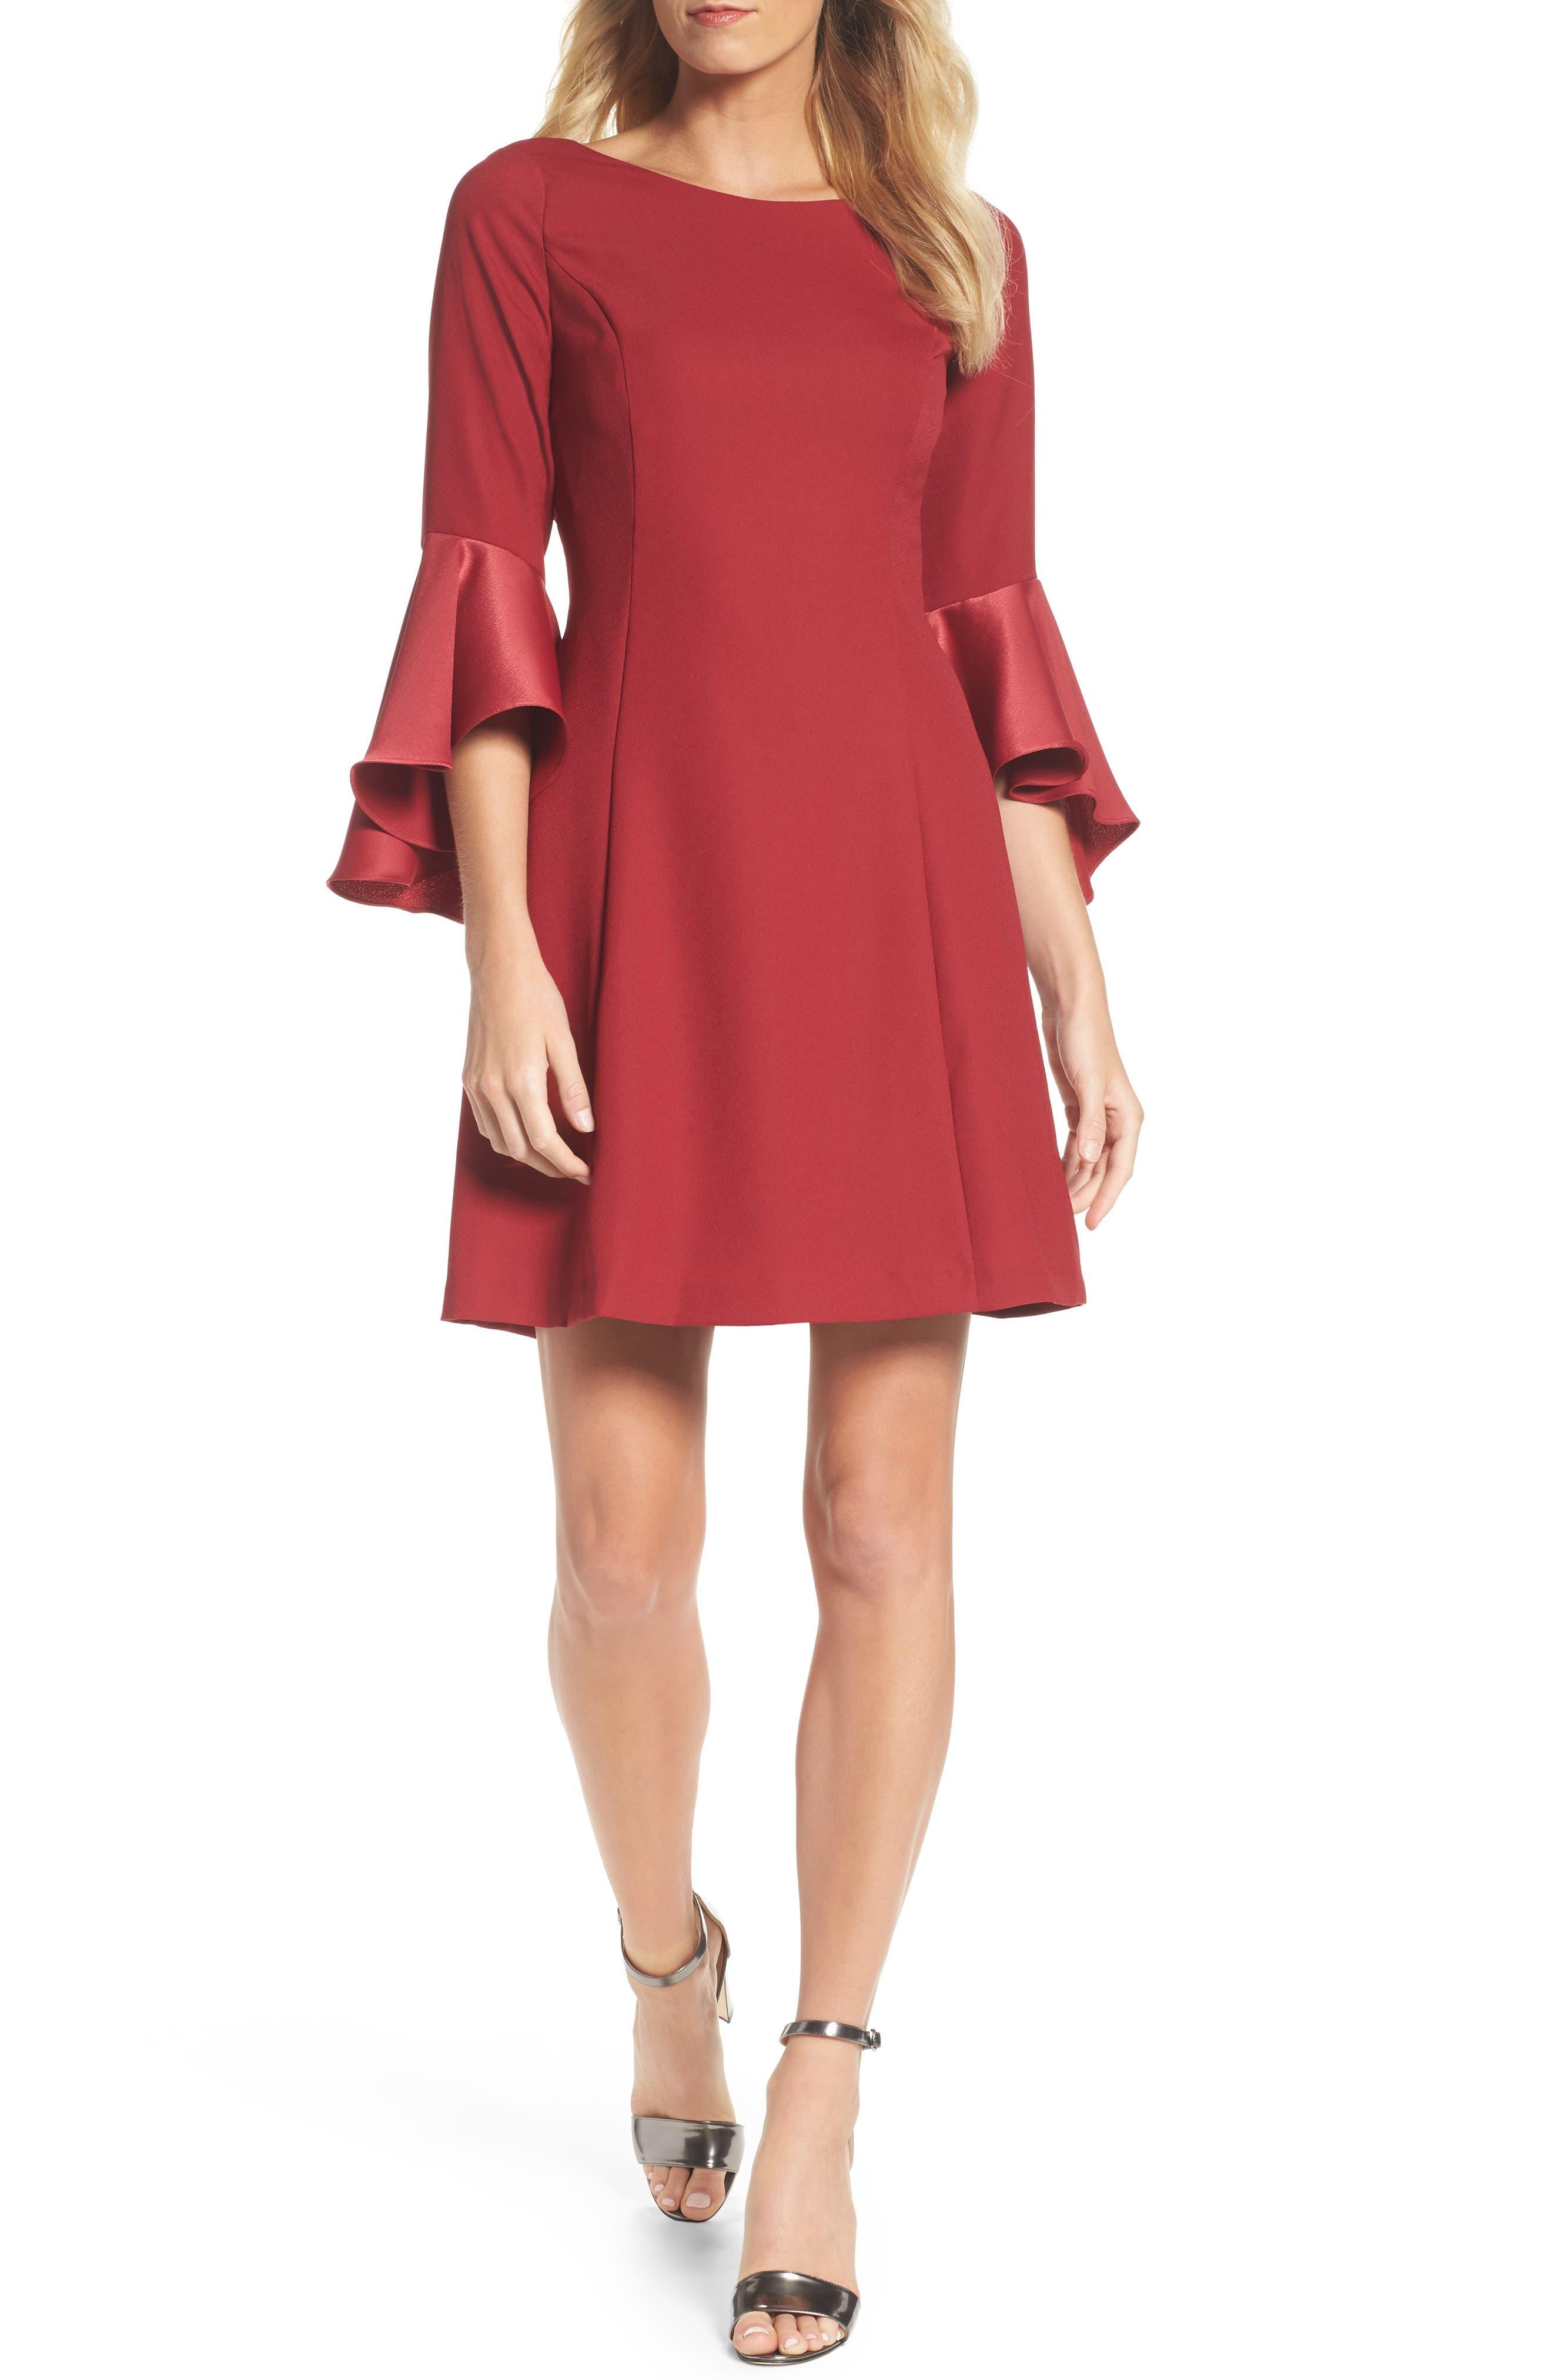 Adrianna Papell Satin Ruffle Sleeve A-Line Dress